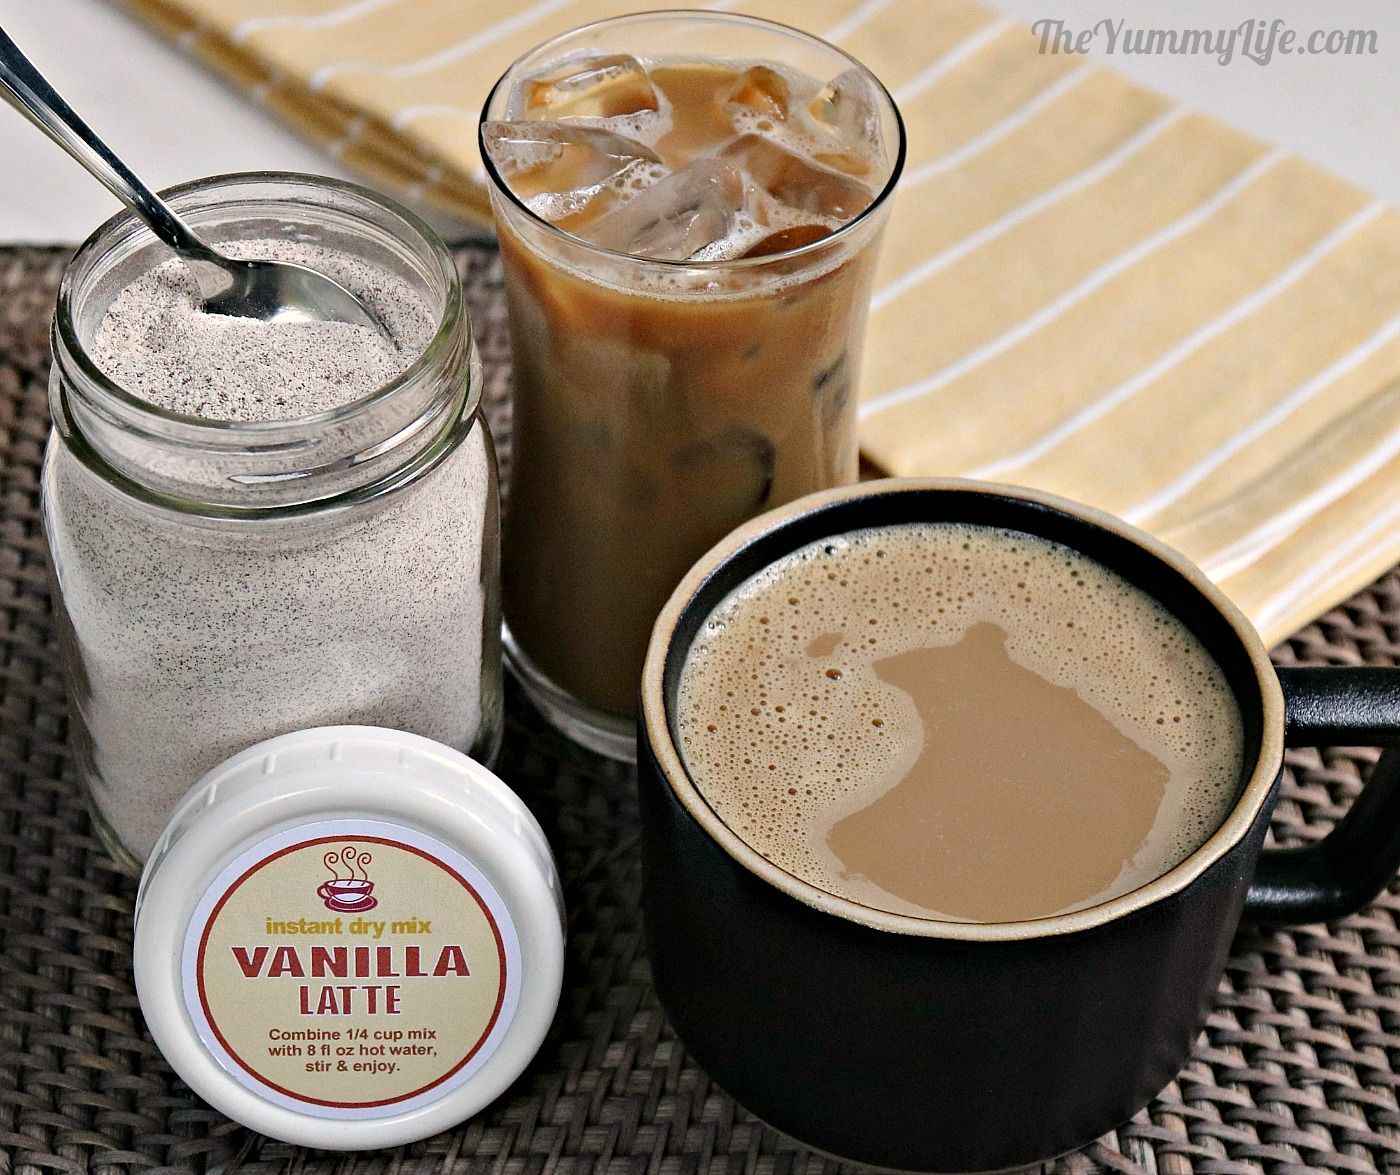 Latte Instant Dry Mix